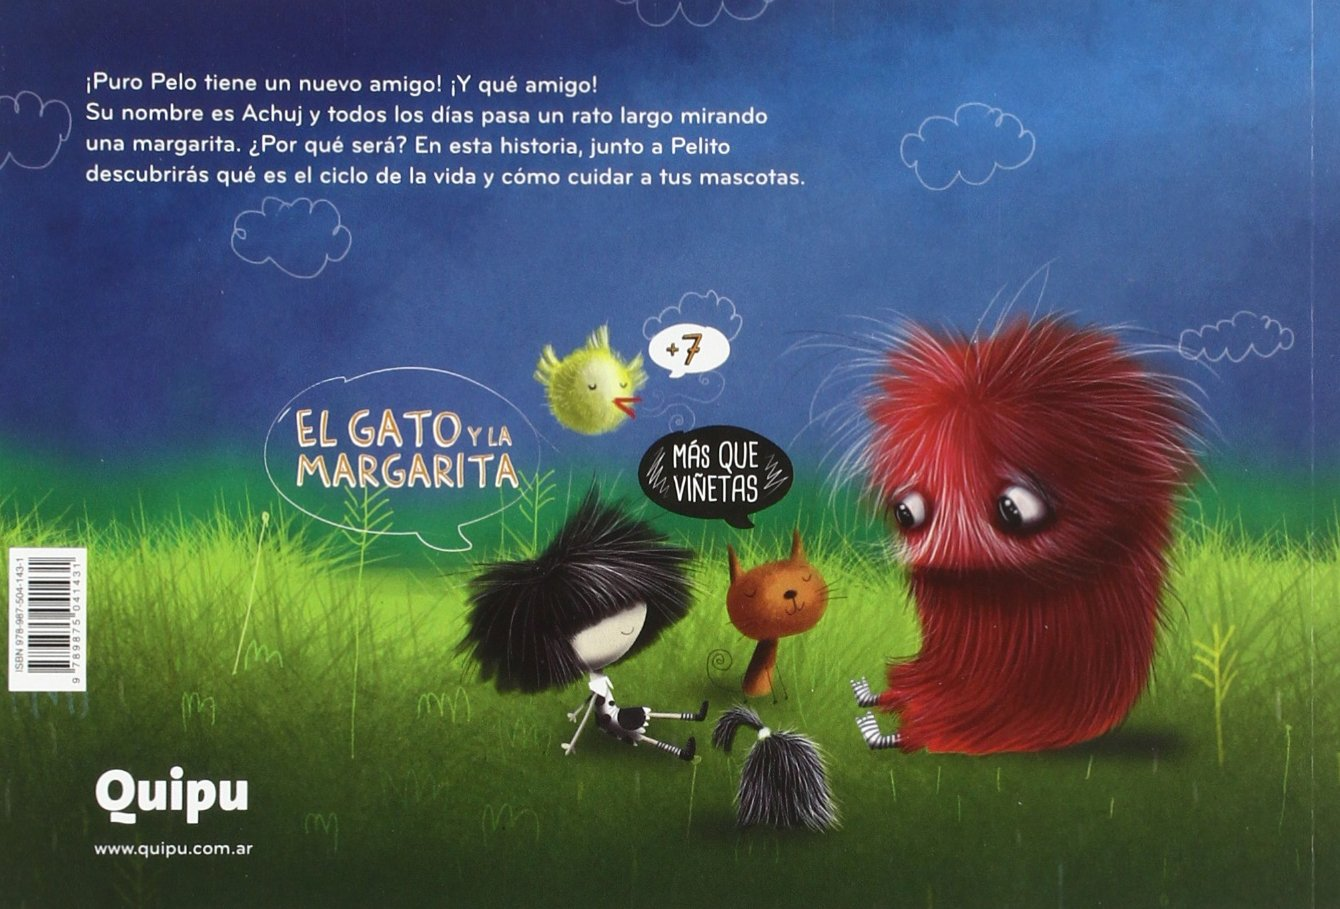 Puro Pelo El Gato Y La Margarita: Fabián Sevilla: 9789875041431: Amazon.com: Books